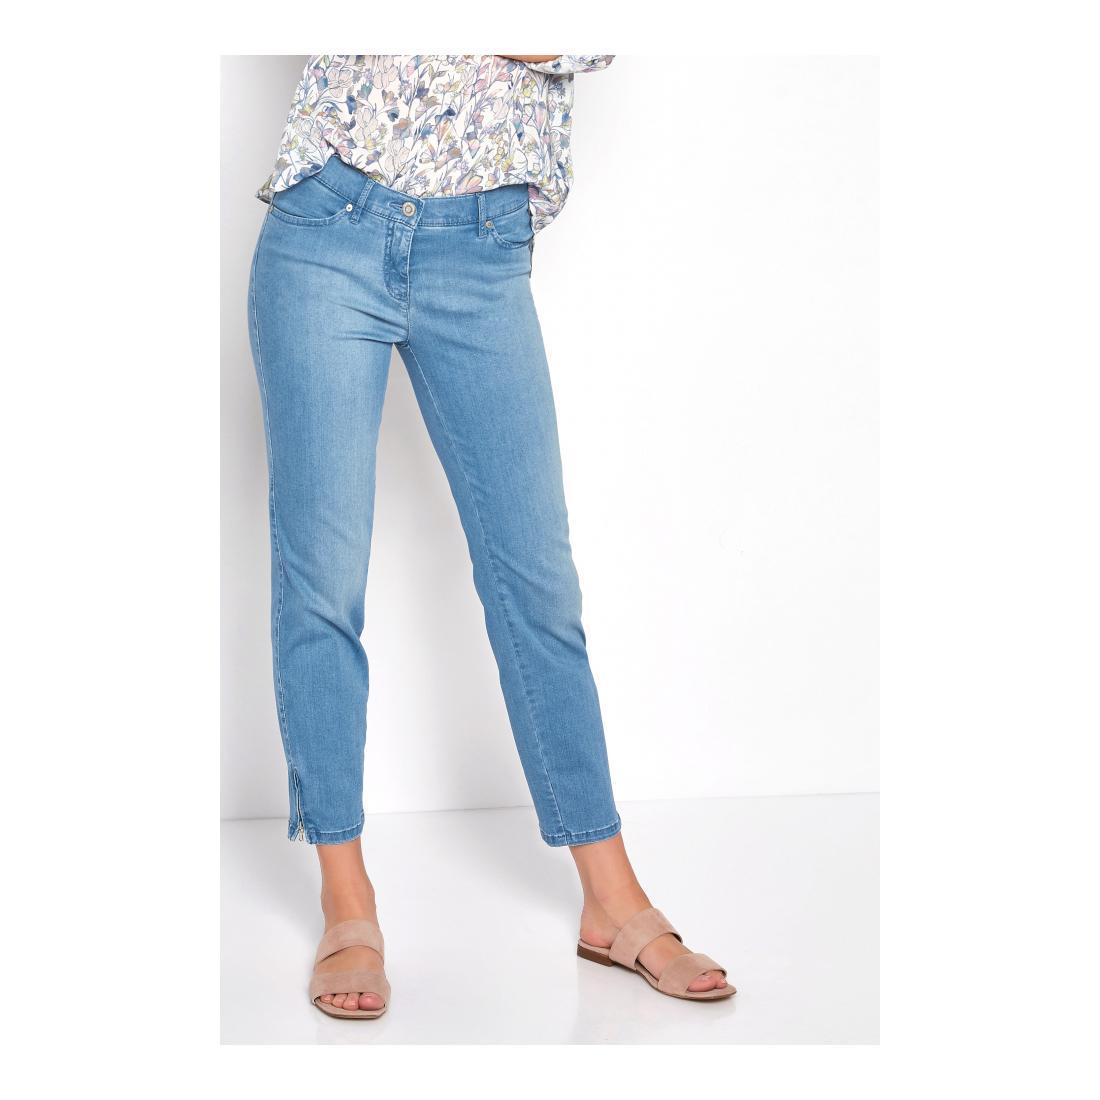 TONI DRESS Jeans Damen Perfect Shape Zip 7/